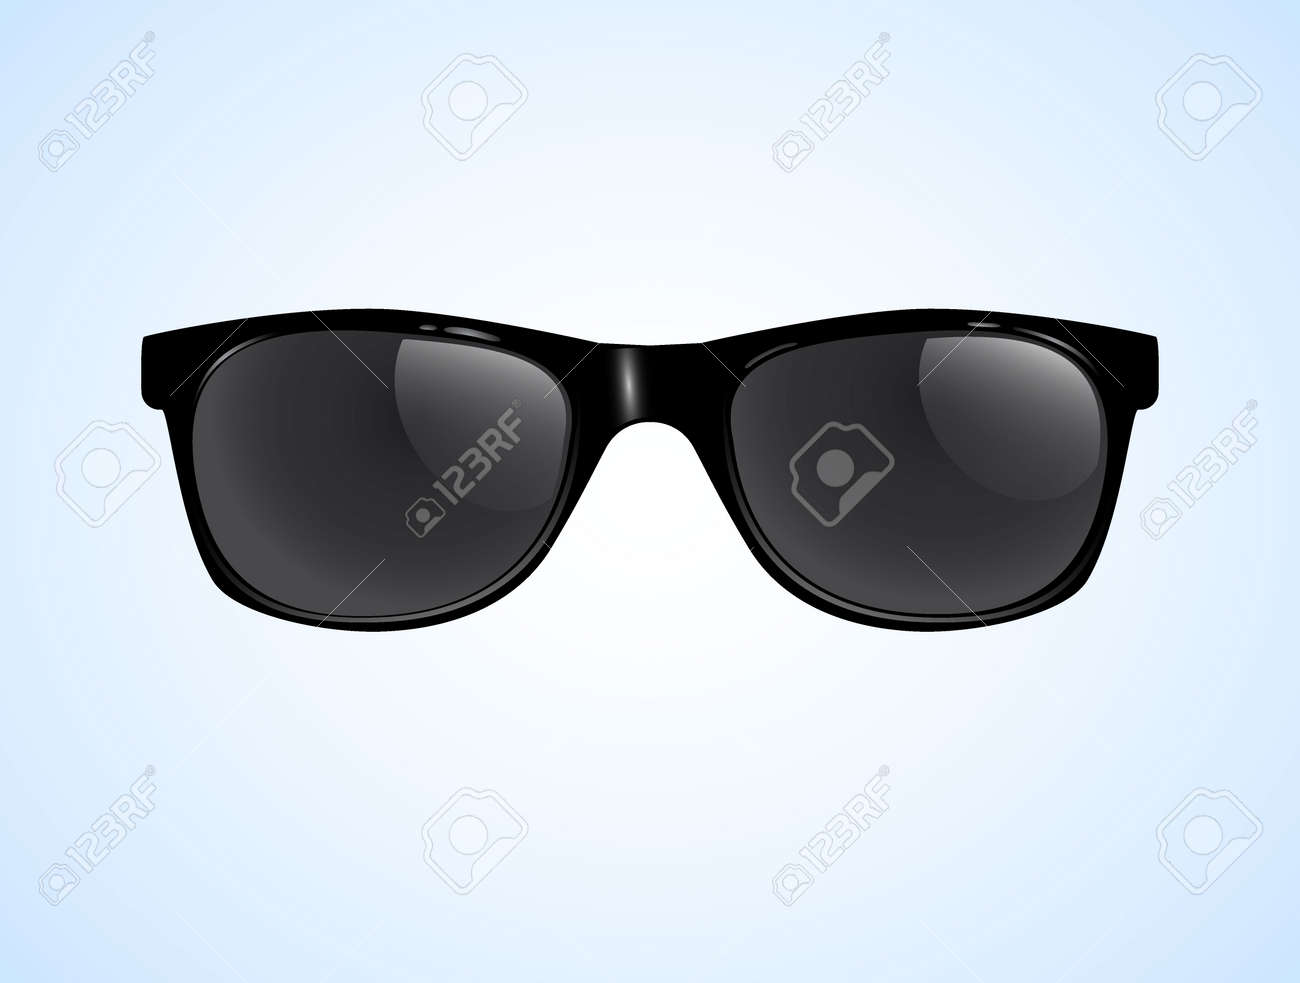 Sunglasses Vector Isolated illustration background. Sunglasses Vector Isolated illustration background - 173035247